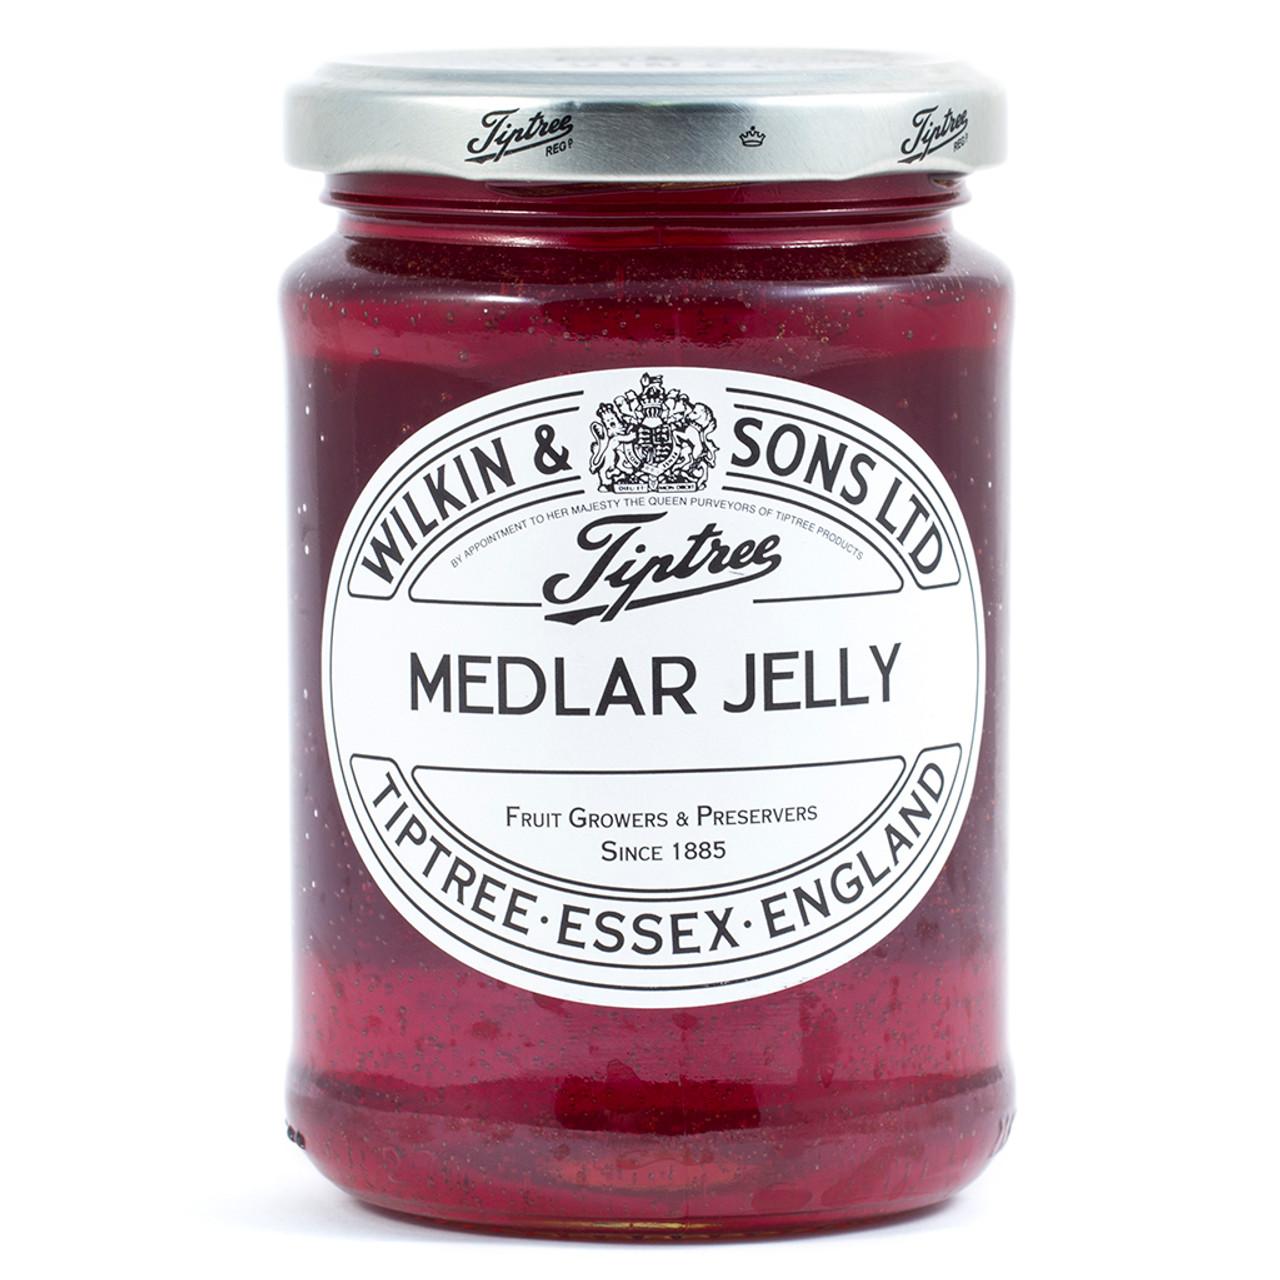 Tiptree Medlar Jelly 340g - TOO